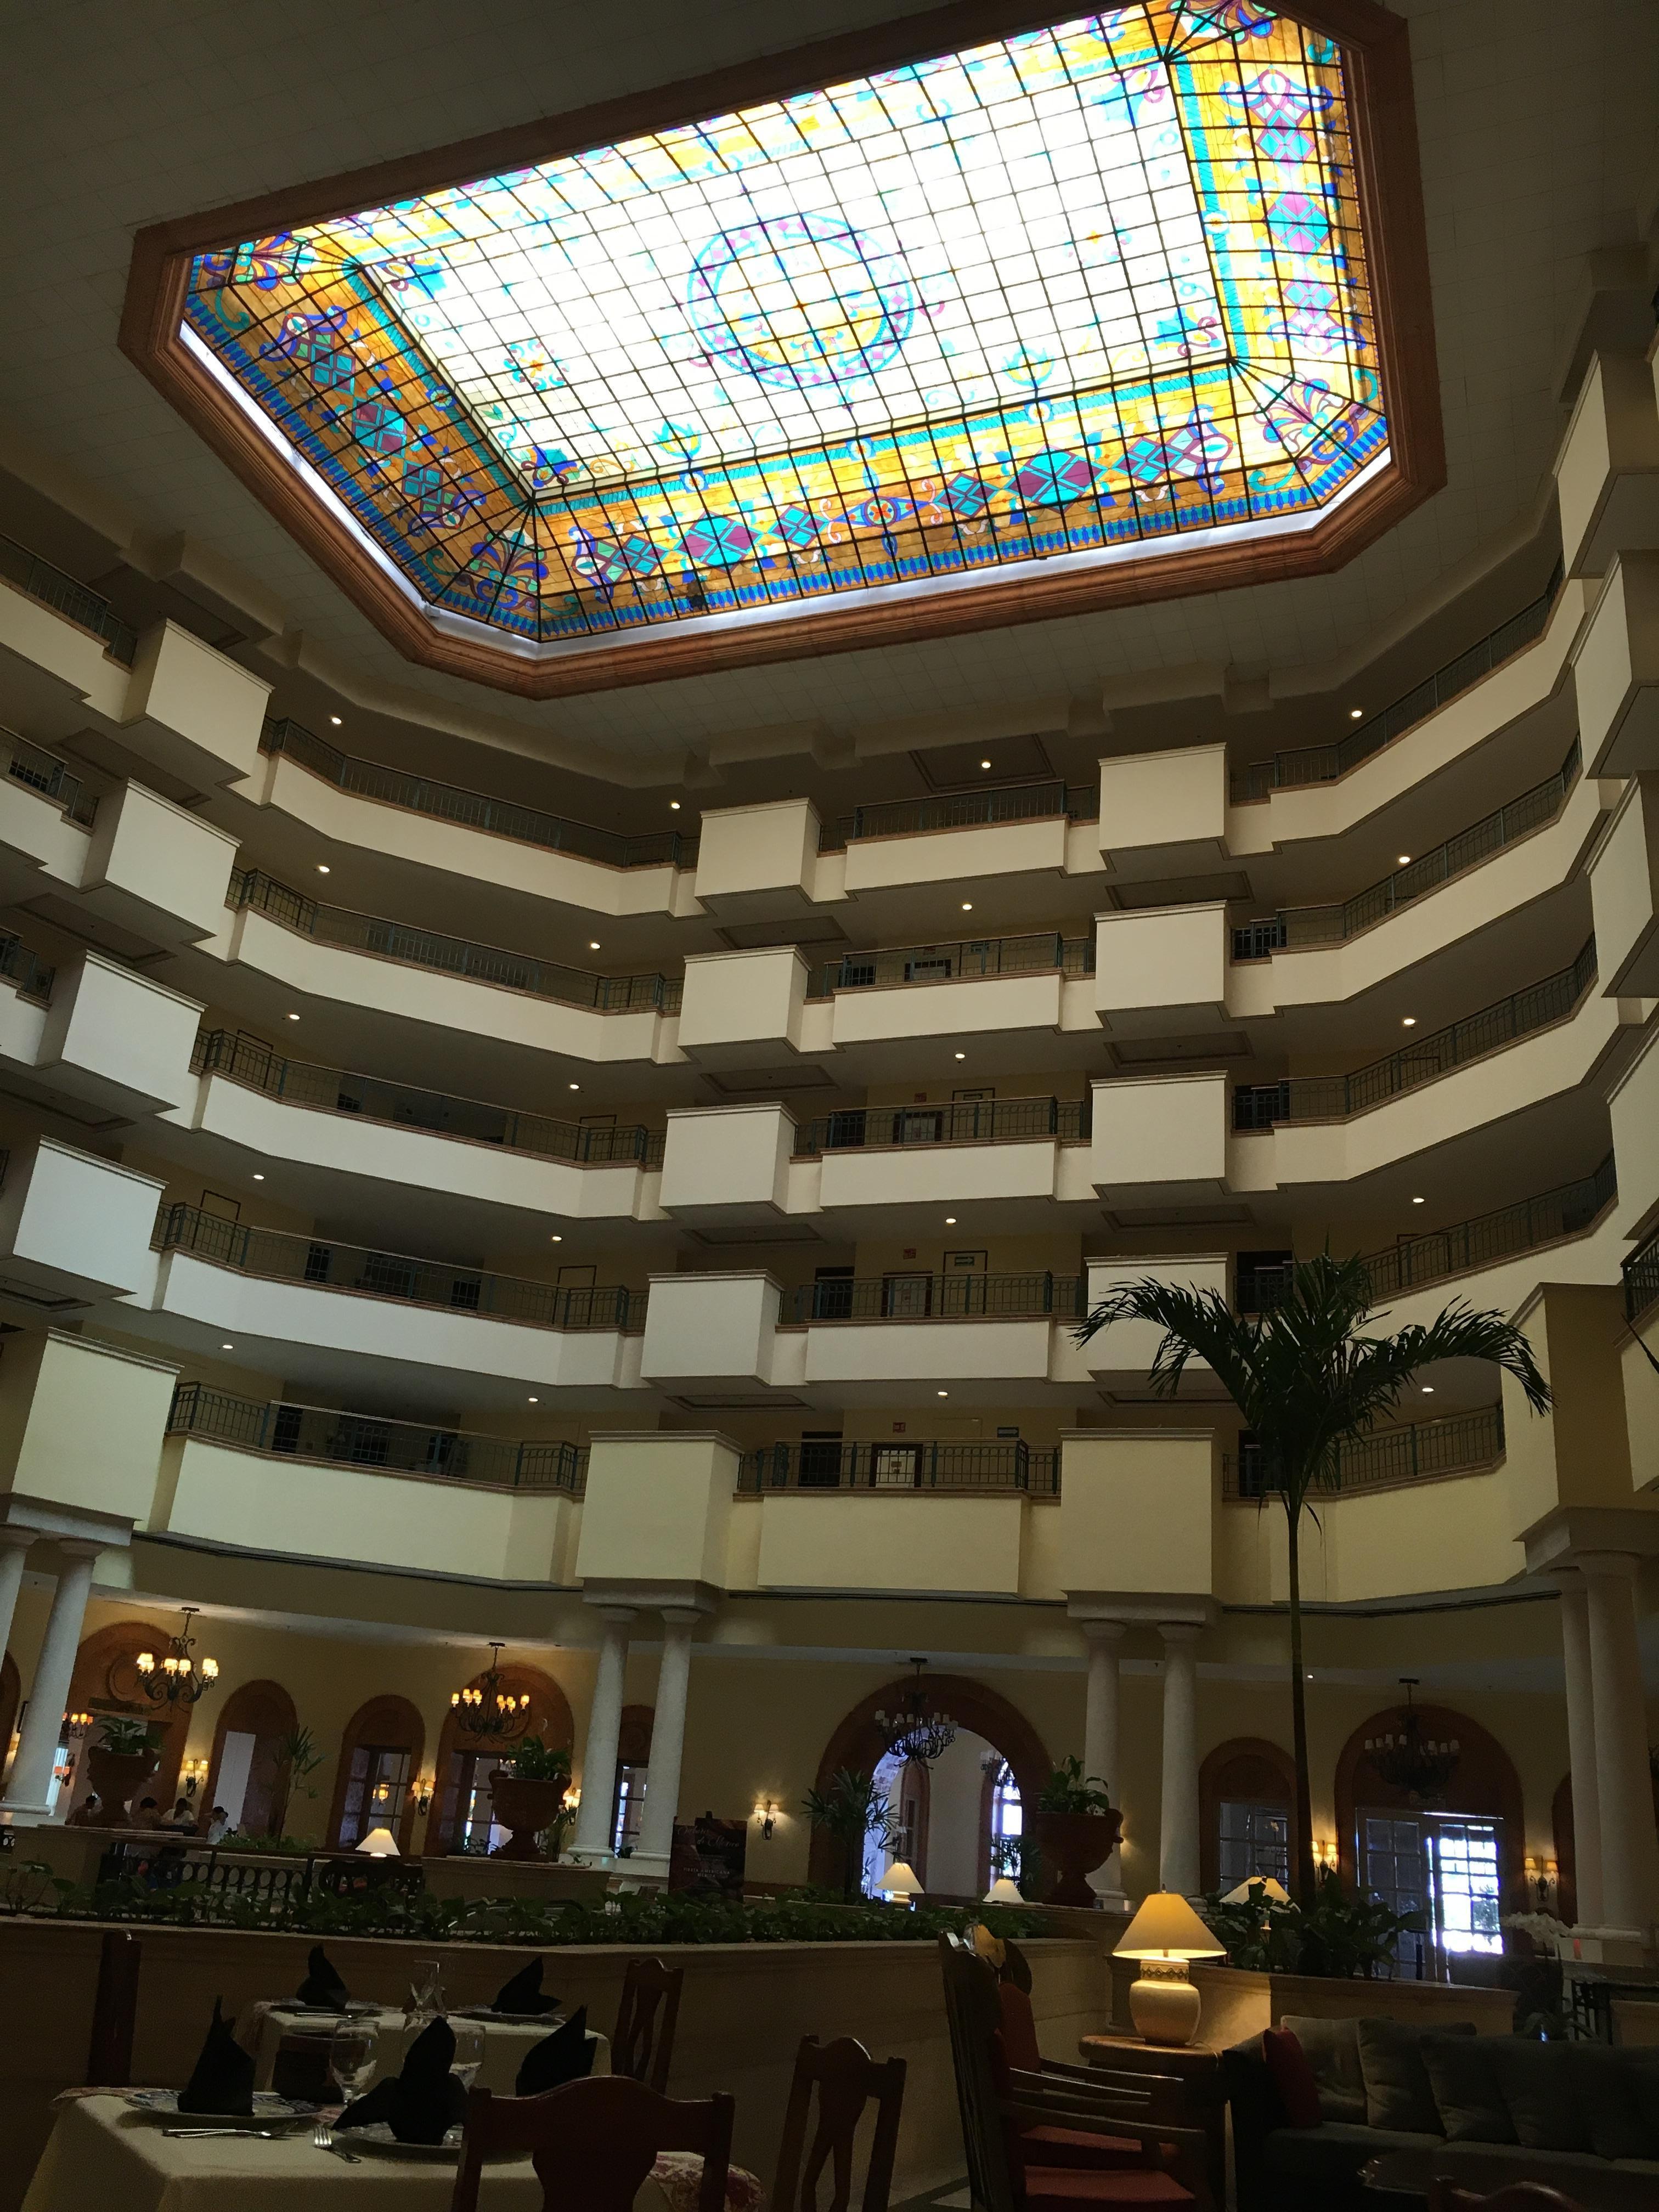 Hall hotel beautiful vitrales